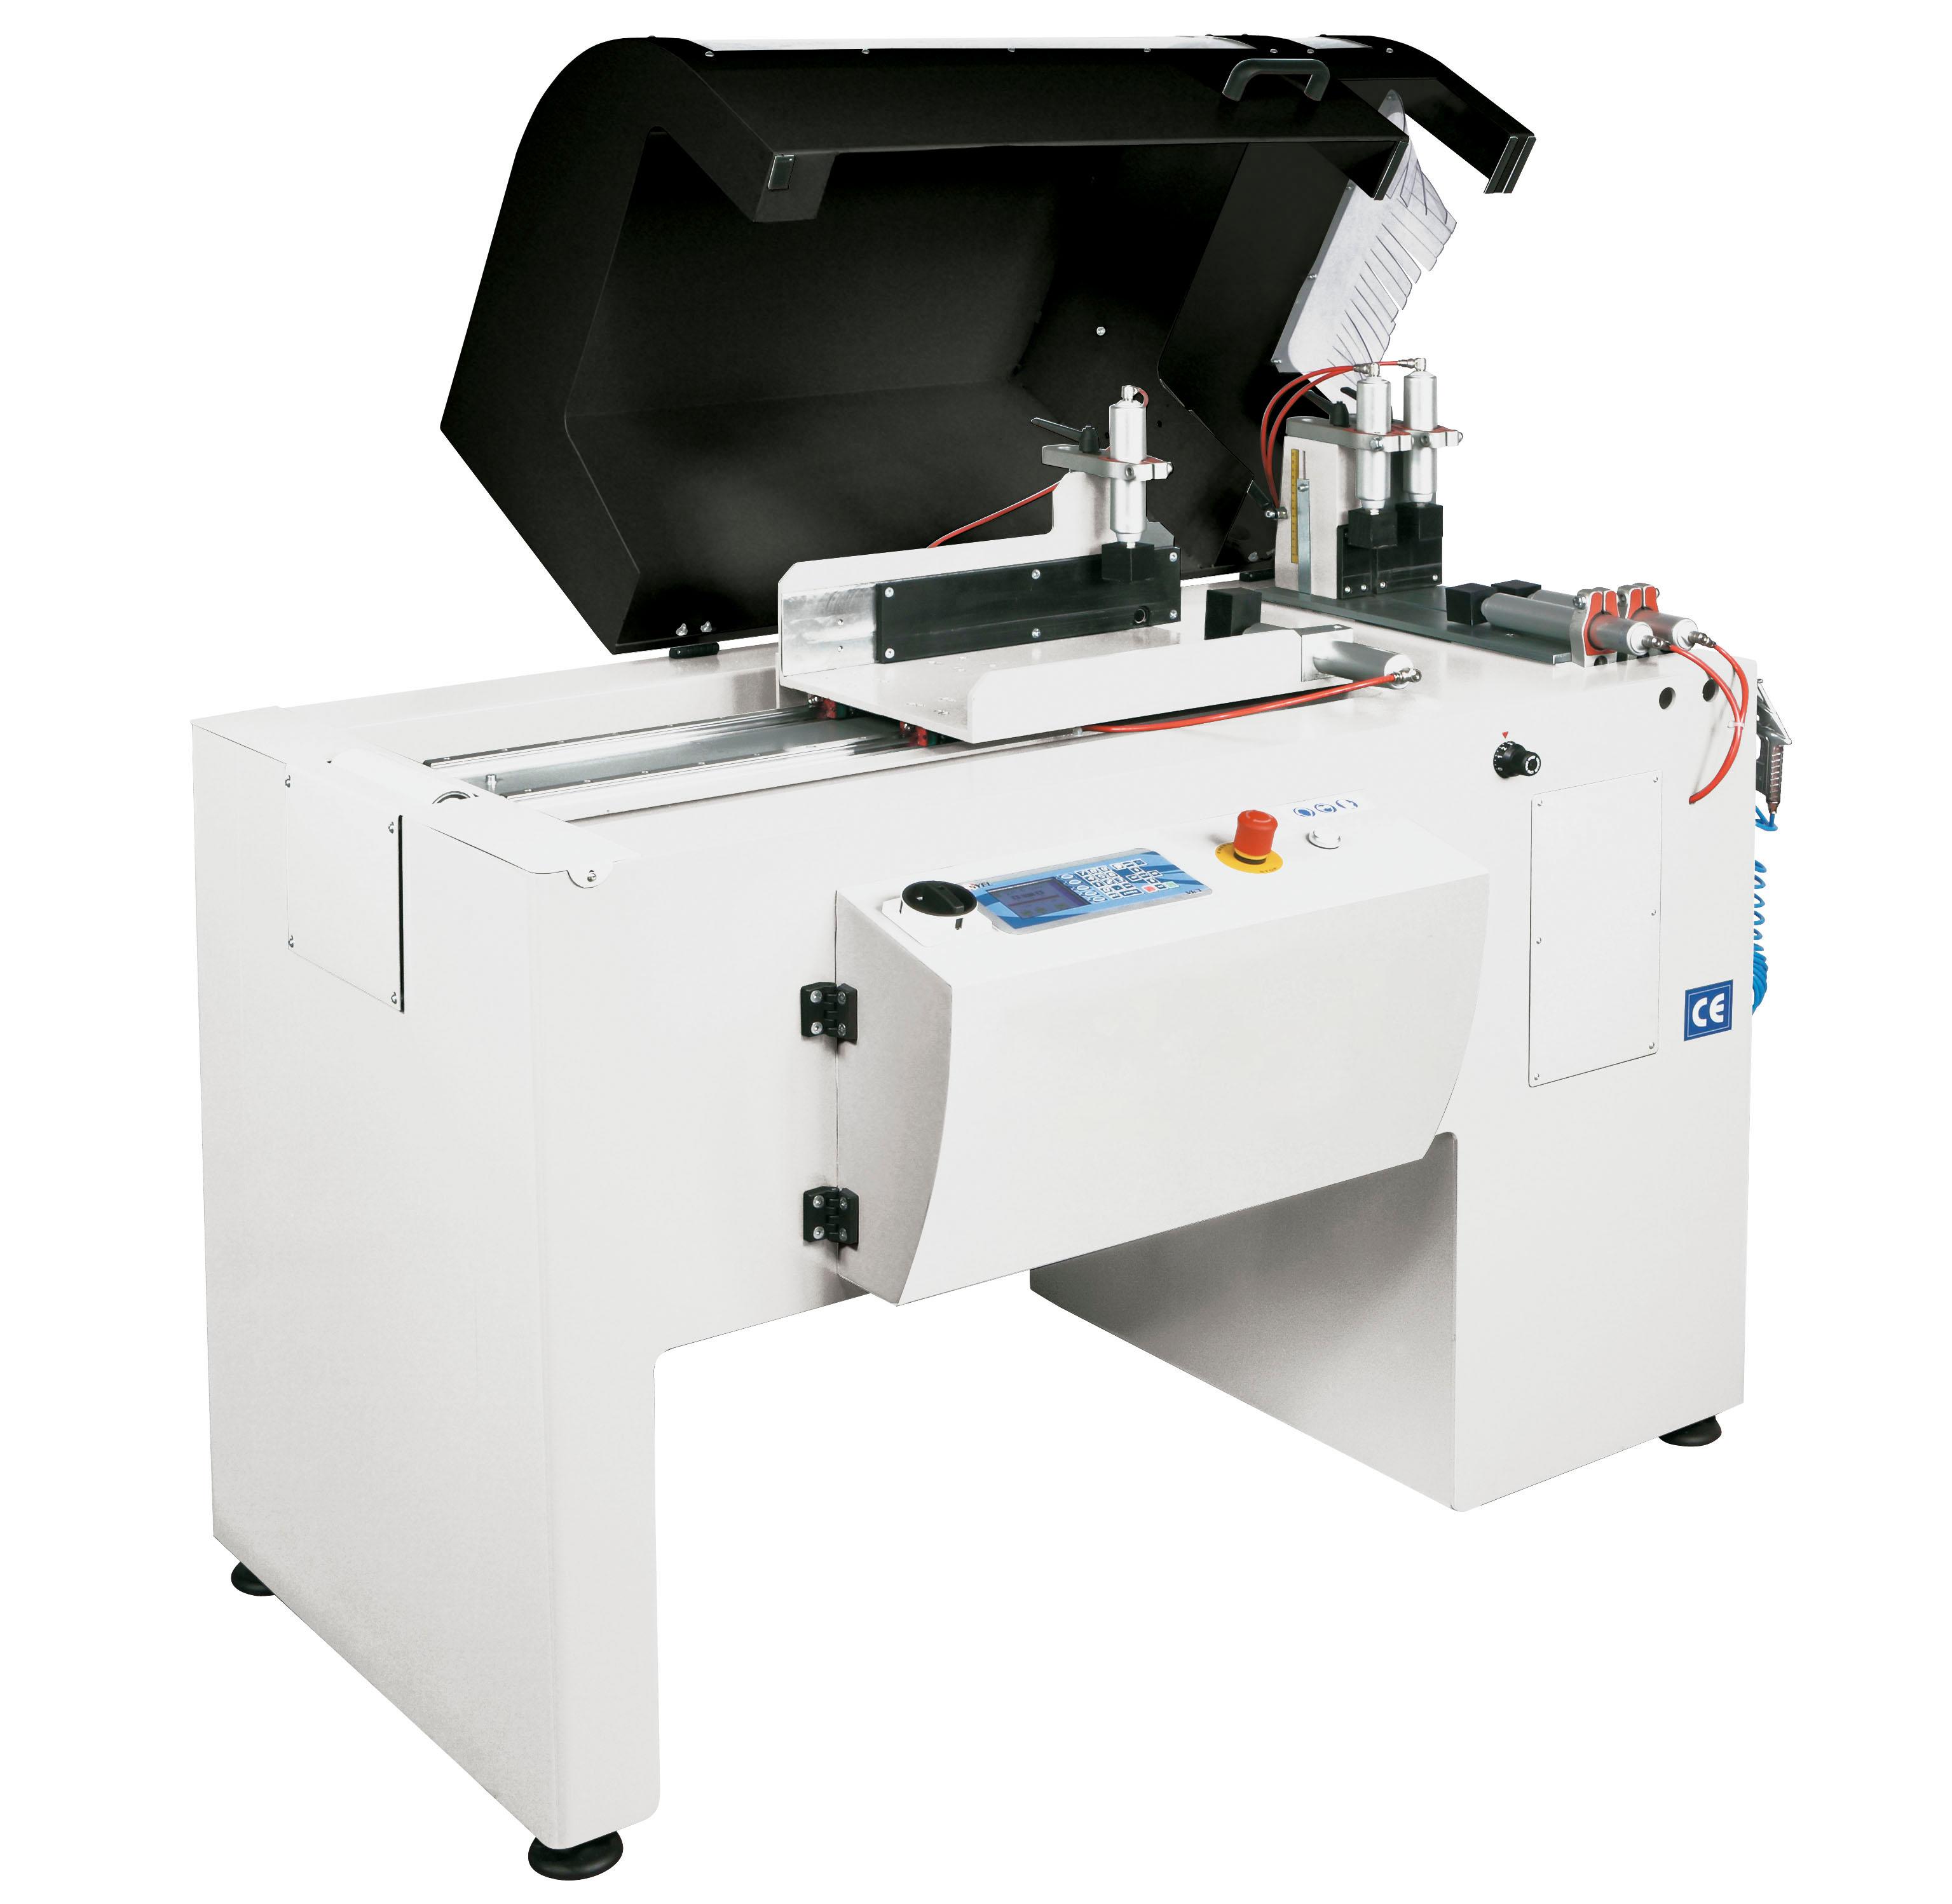 ZIMMER Unterflursägevollautomat CUT450CNC für Aluminium